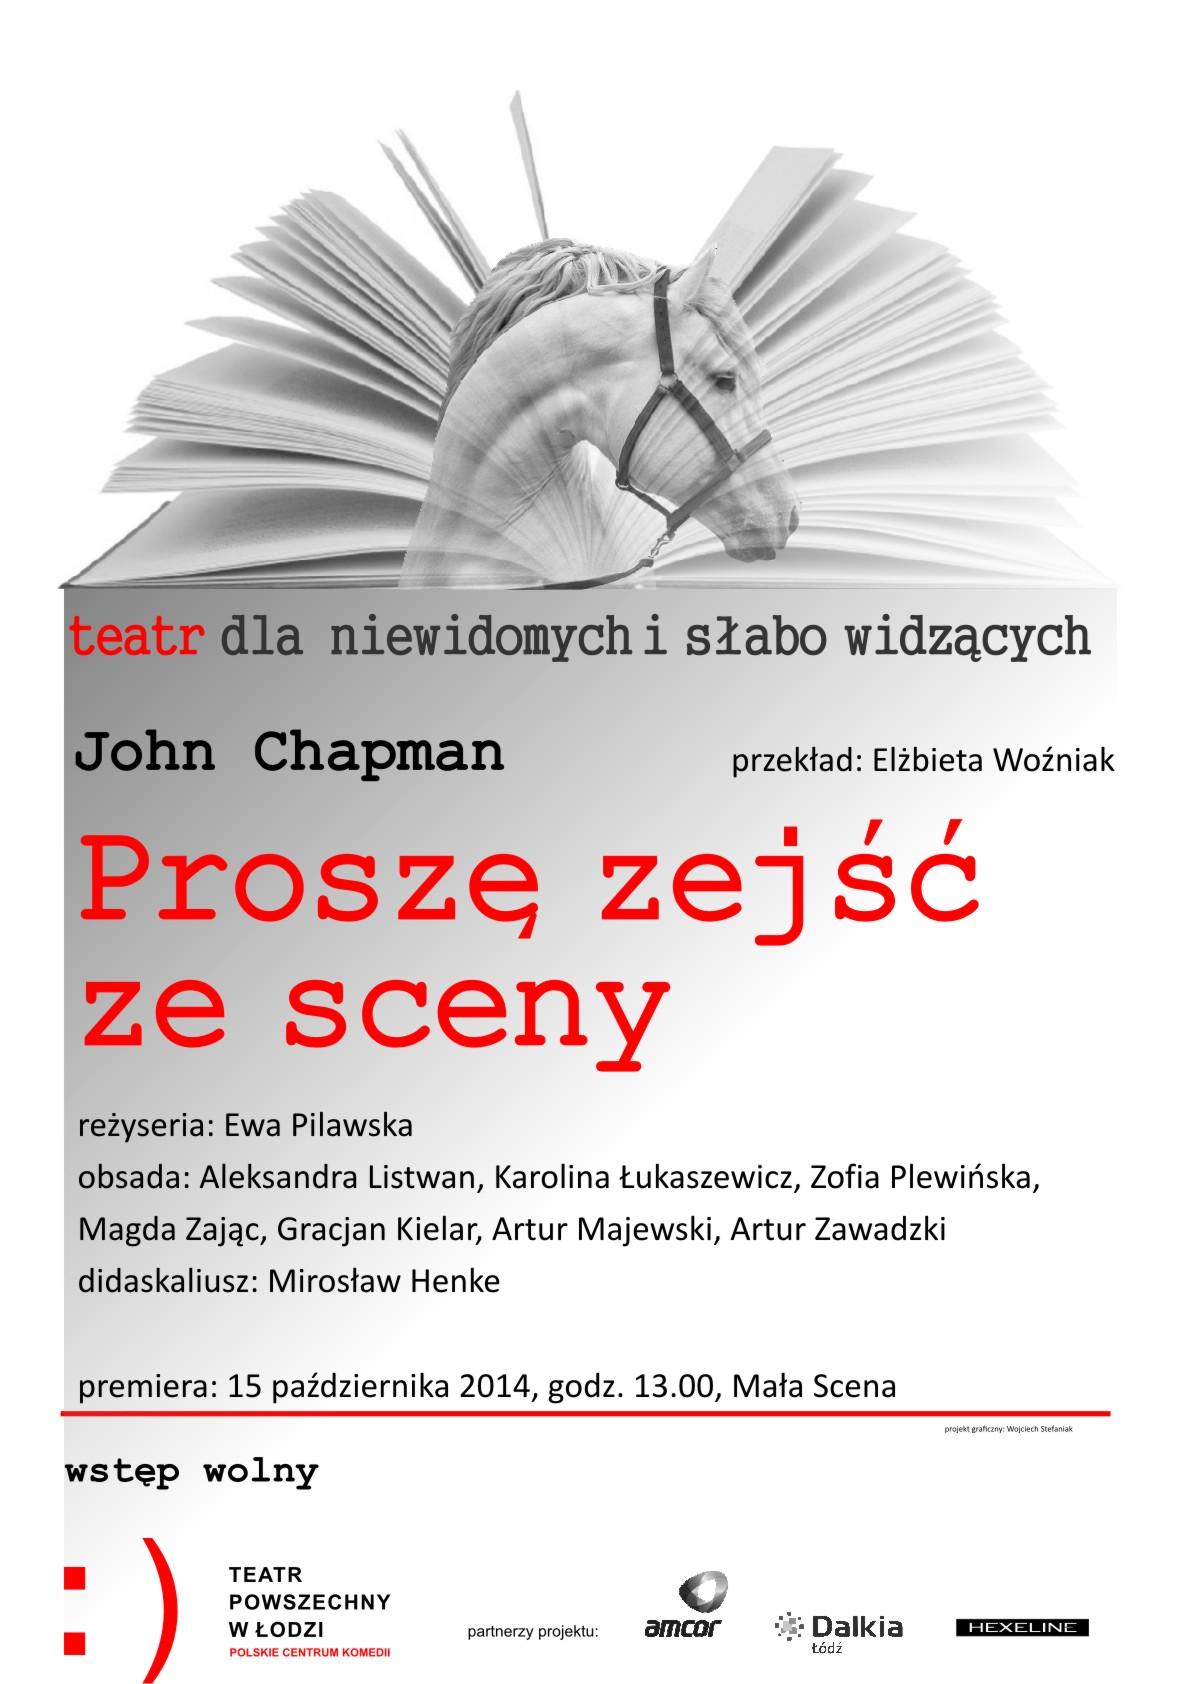 afisz_Prosze_zejsc_ze_sceny-1_2